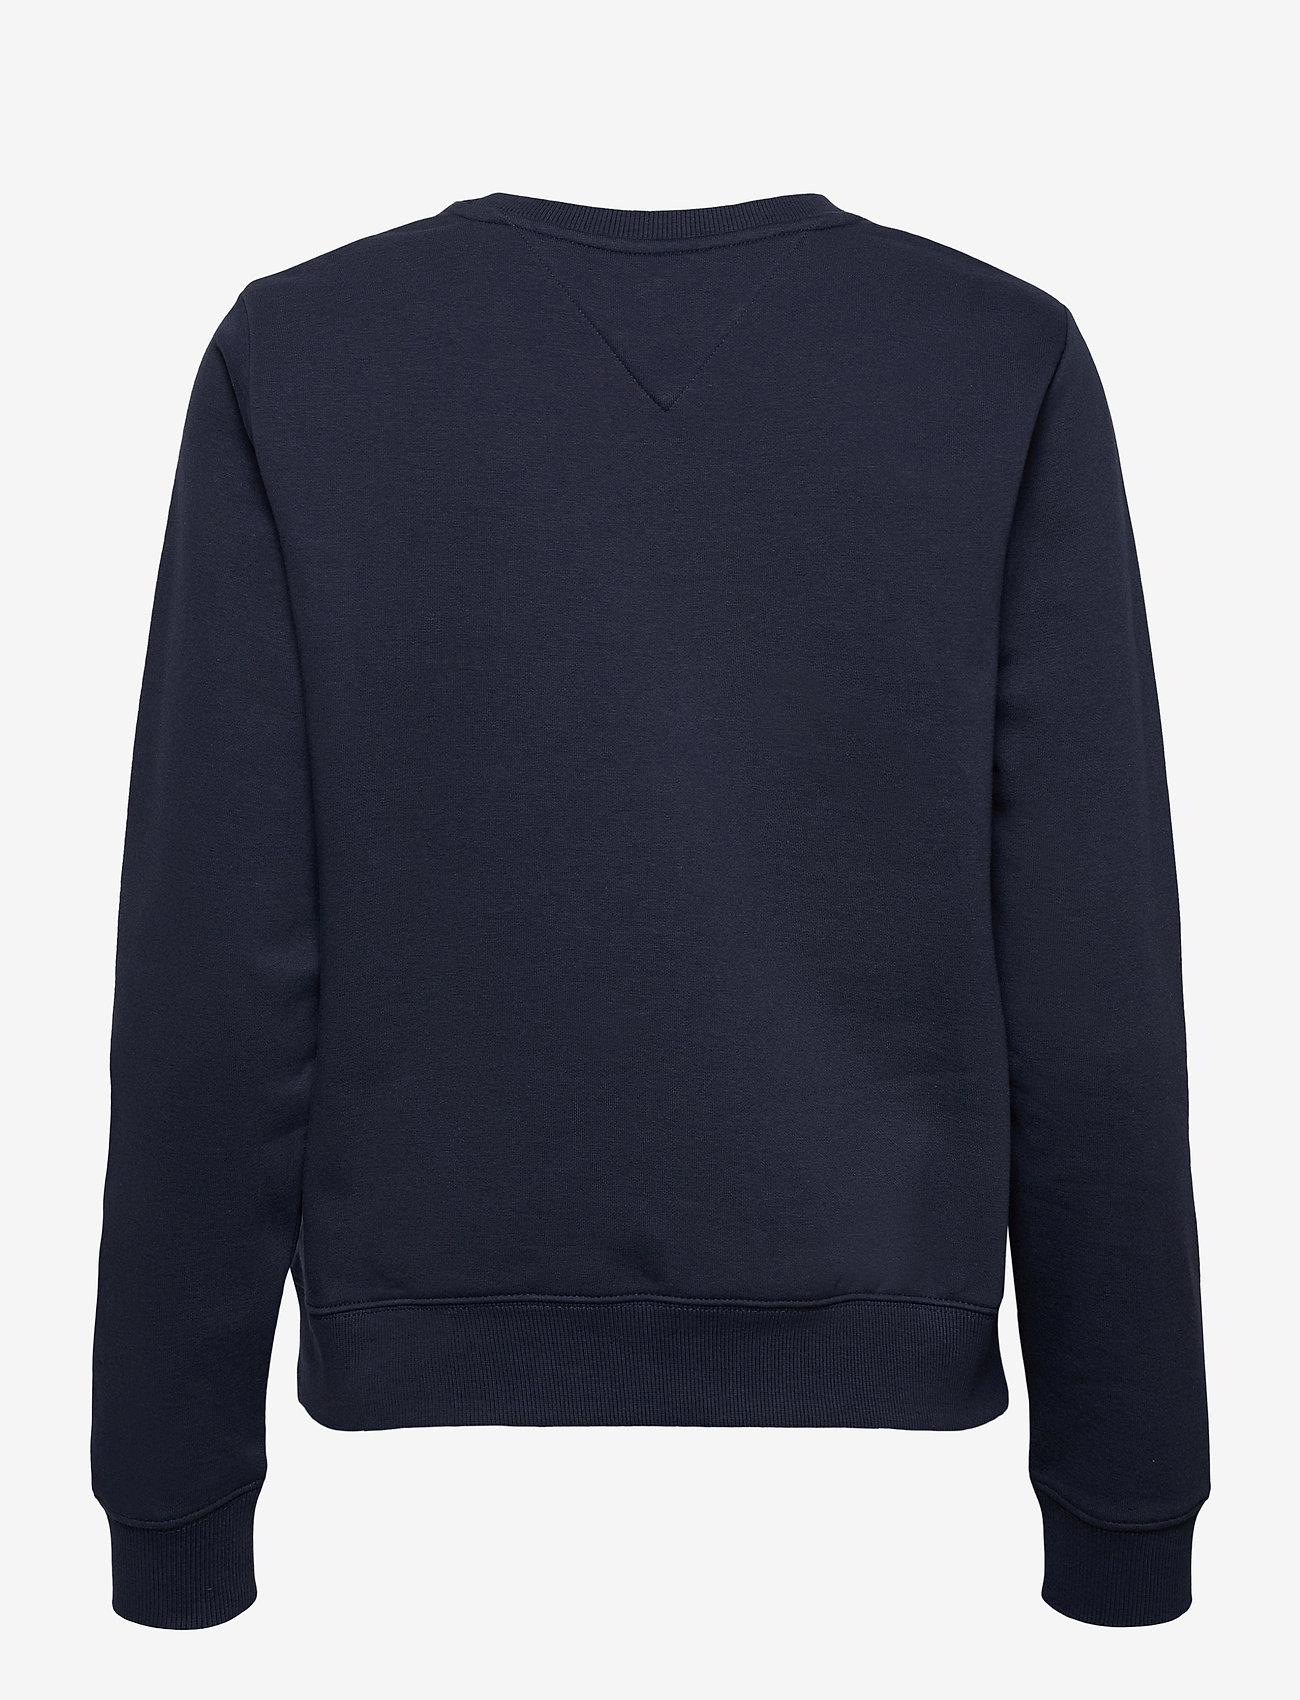 Tommy Jeans - TJW REGULAR TWISTED LOGO CREW - sweatshirts & hoodies - twilight navy - 1